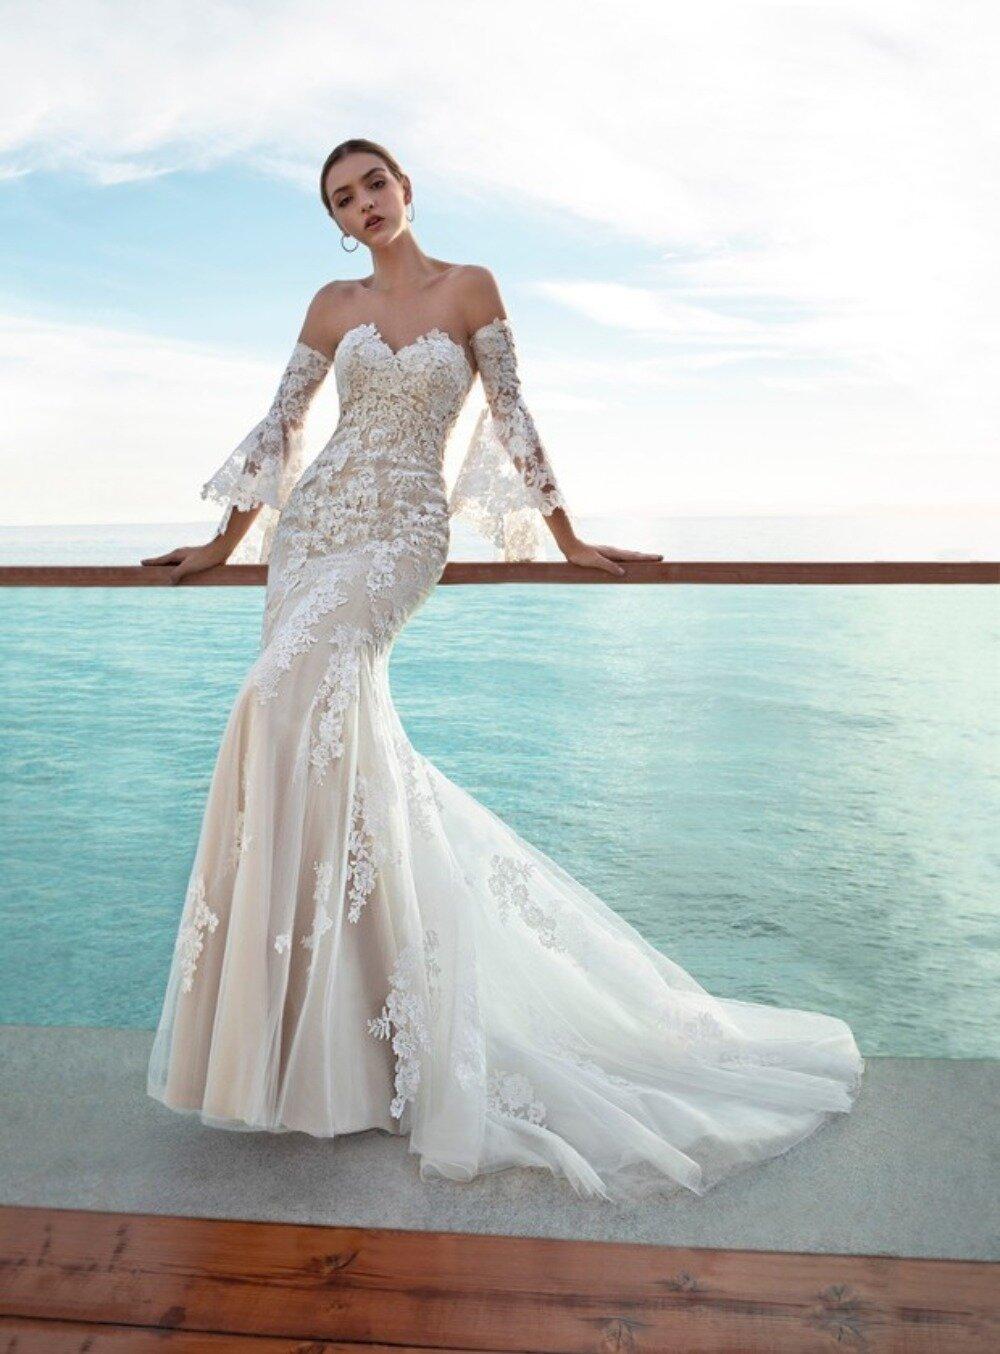 830623_wedding-dress-trends-we-love-for-2020-br.jpg